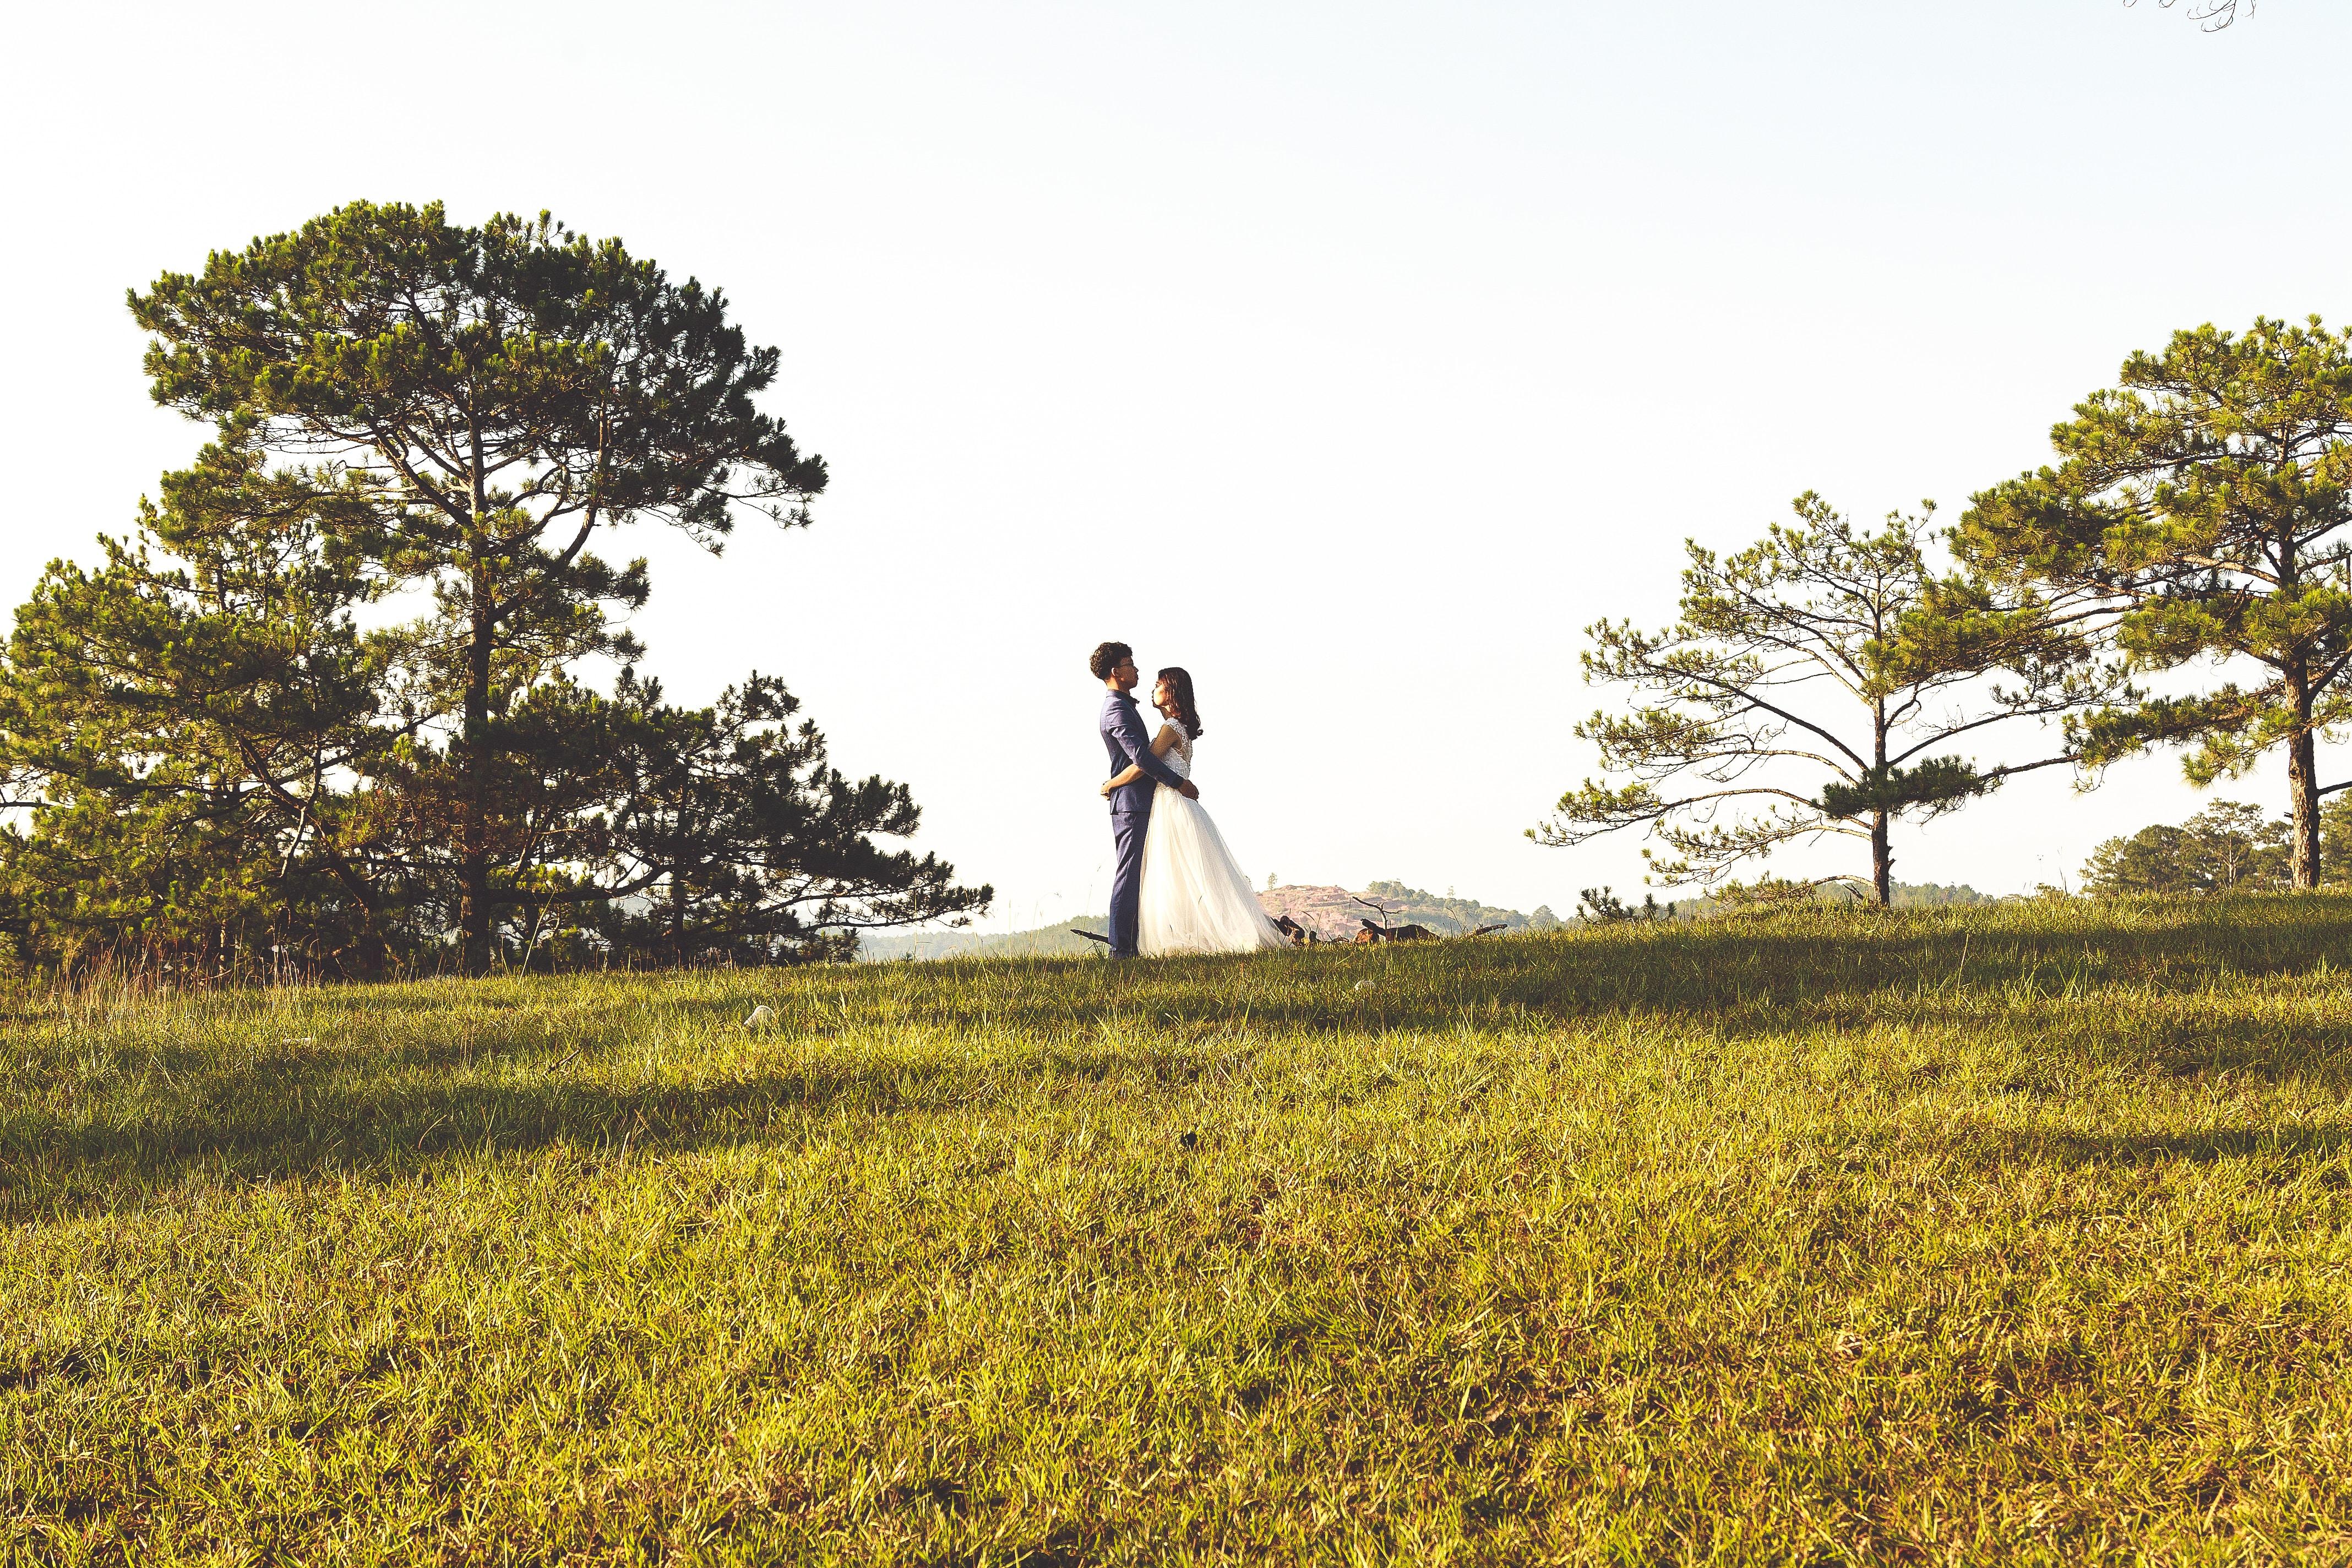 groom and bride near tree